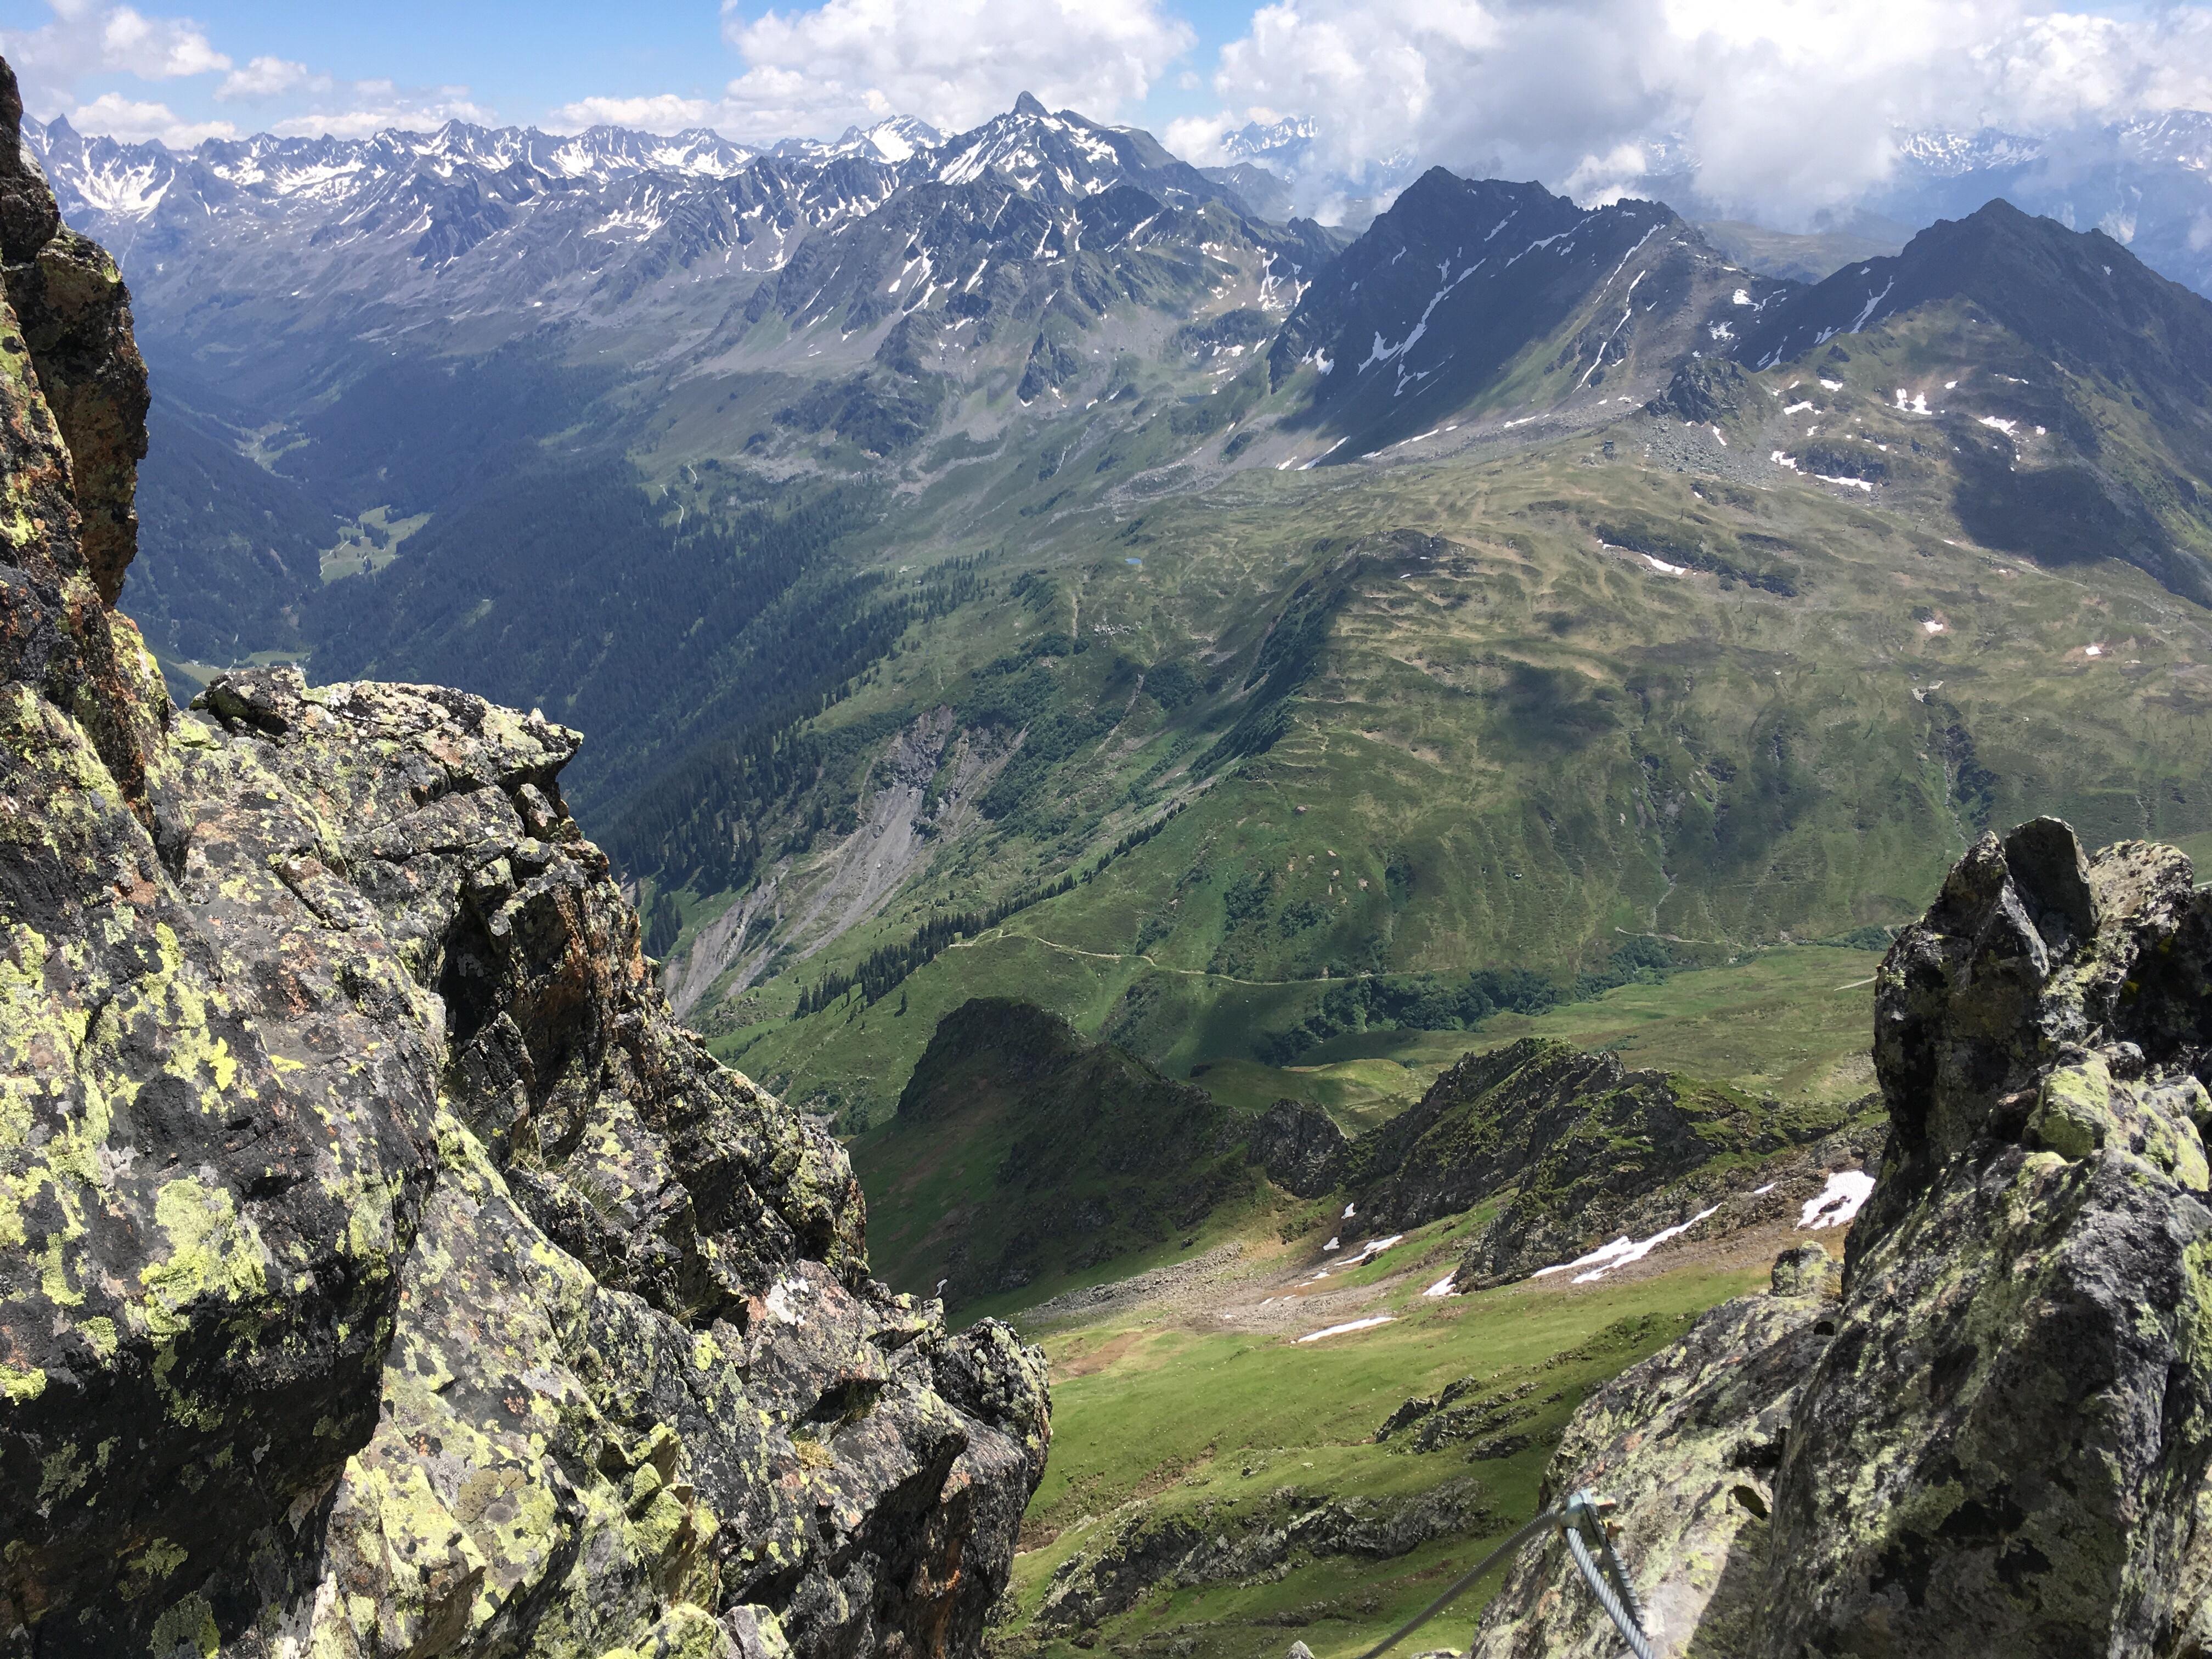 Klettersteig Hochjoch : Silvretta montafon seilbrücke klettersteig hochjoch facebook